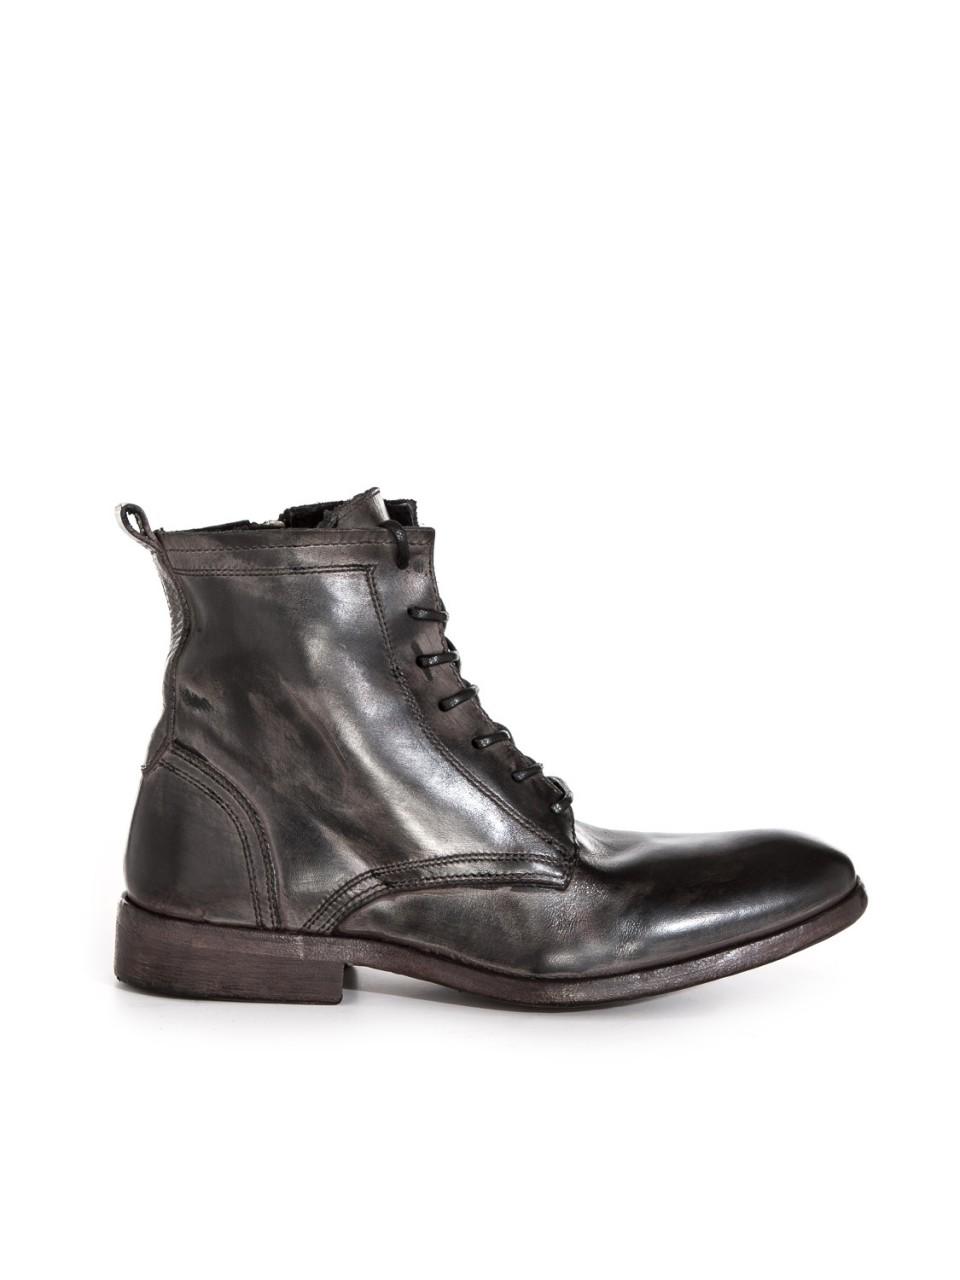 Boots James BLK WSHD/MUD BRN